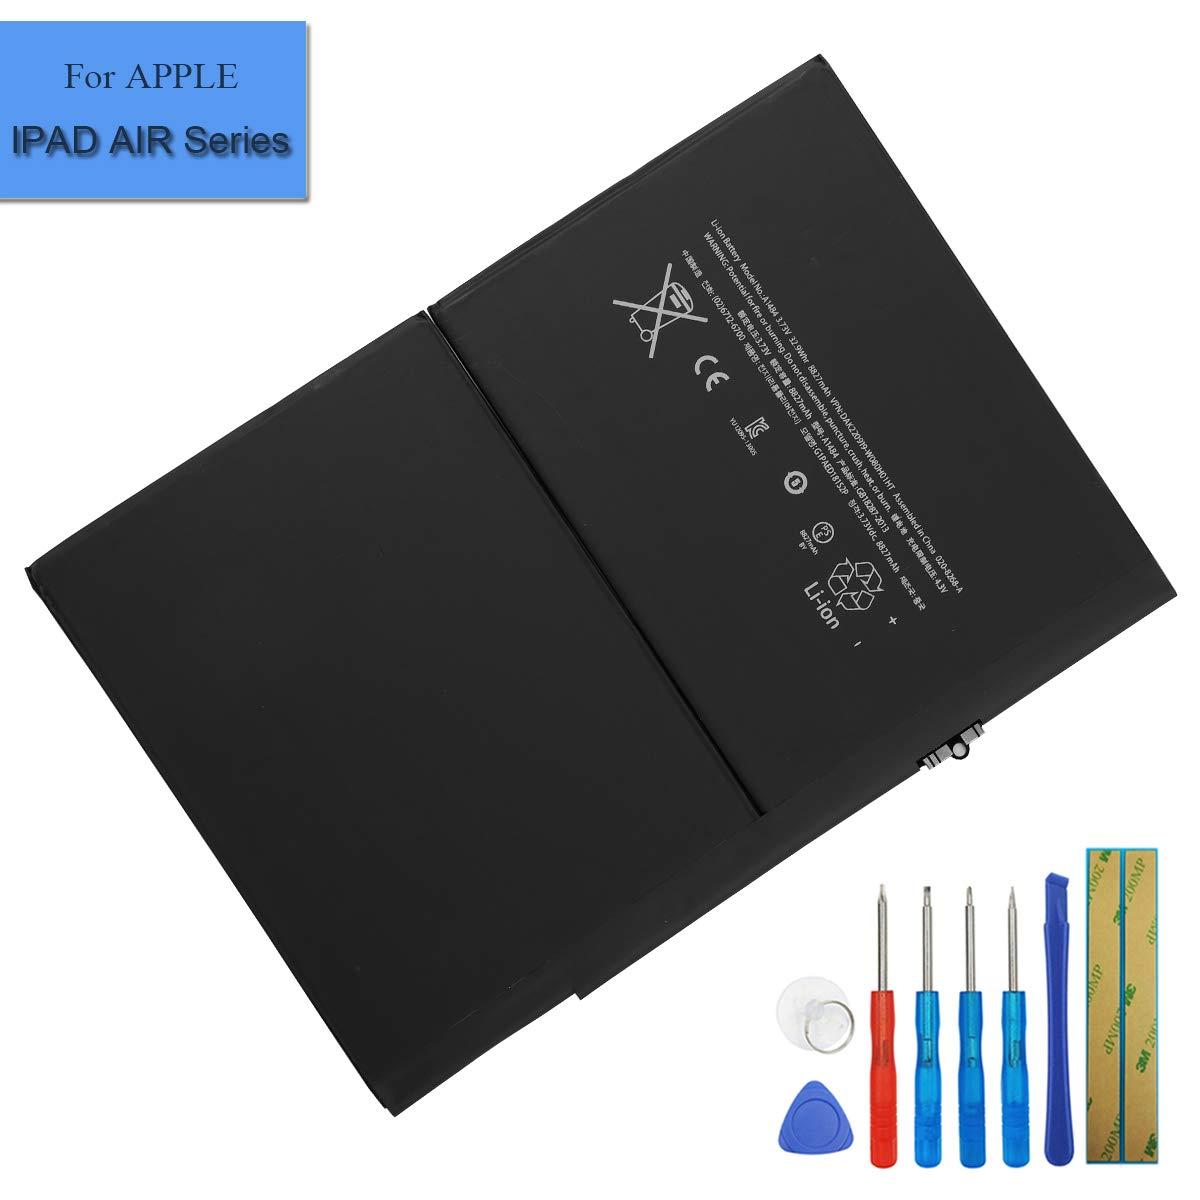 Bateria Tablet A1484 6712-6700 para Apple iPad Air A1475, iP